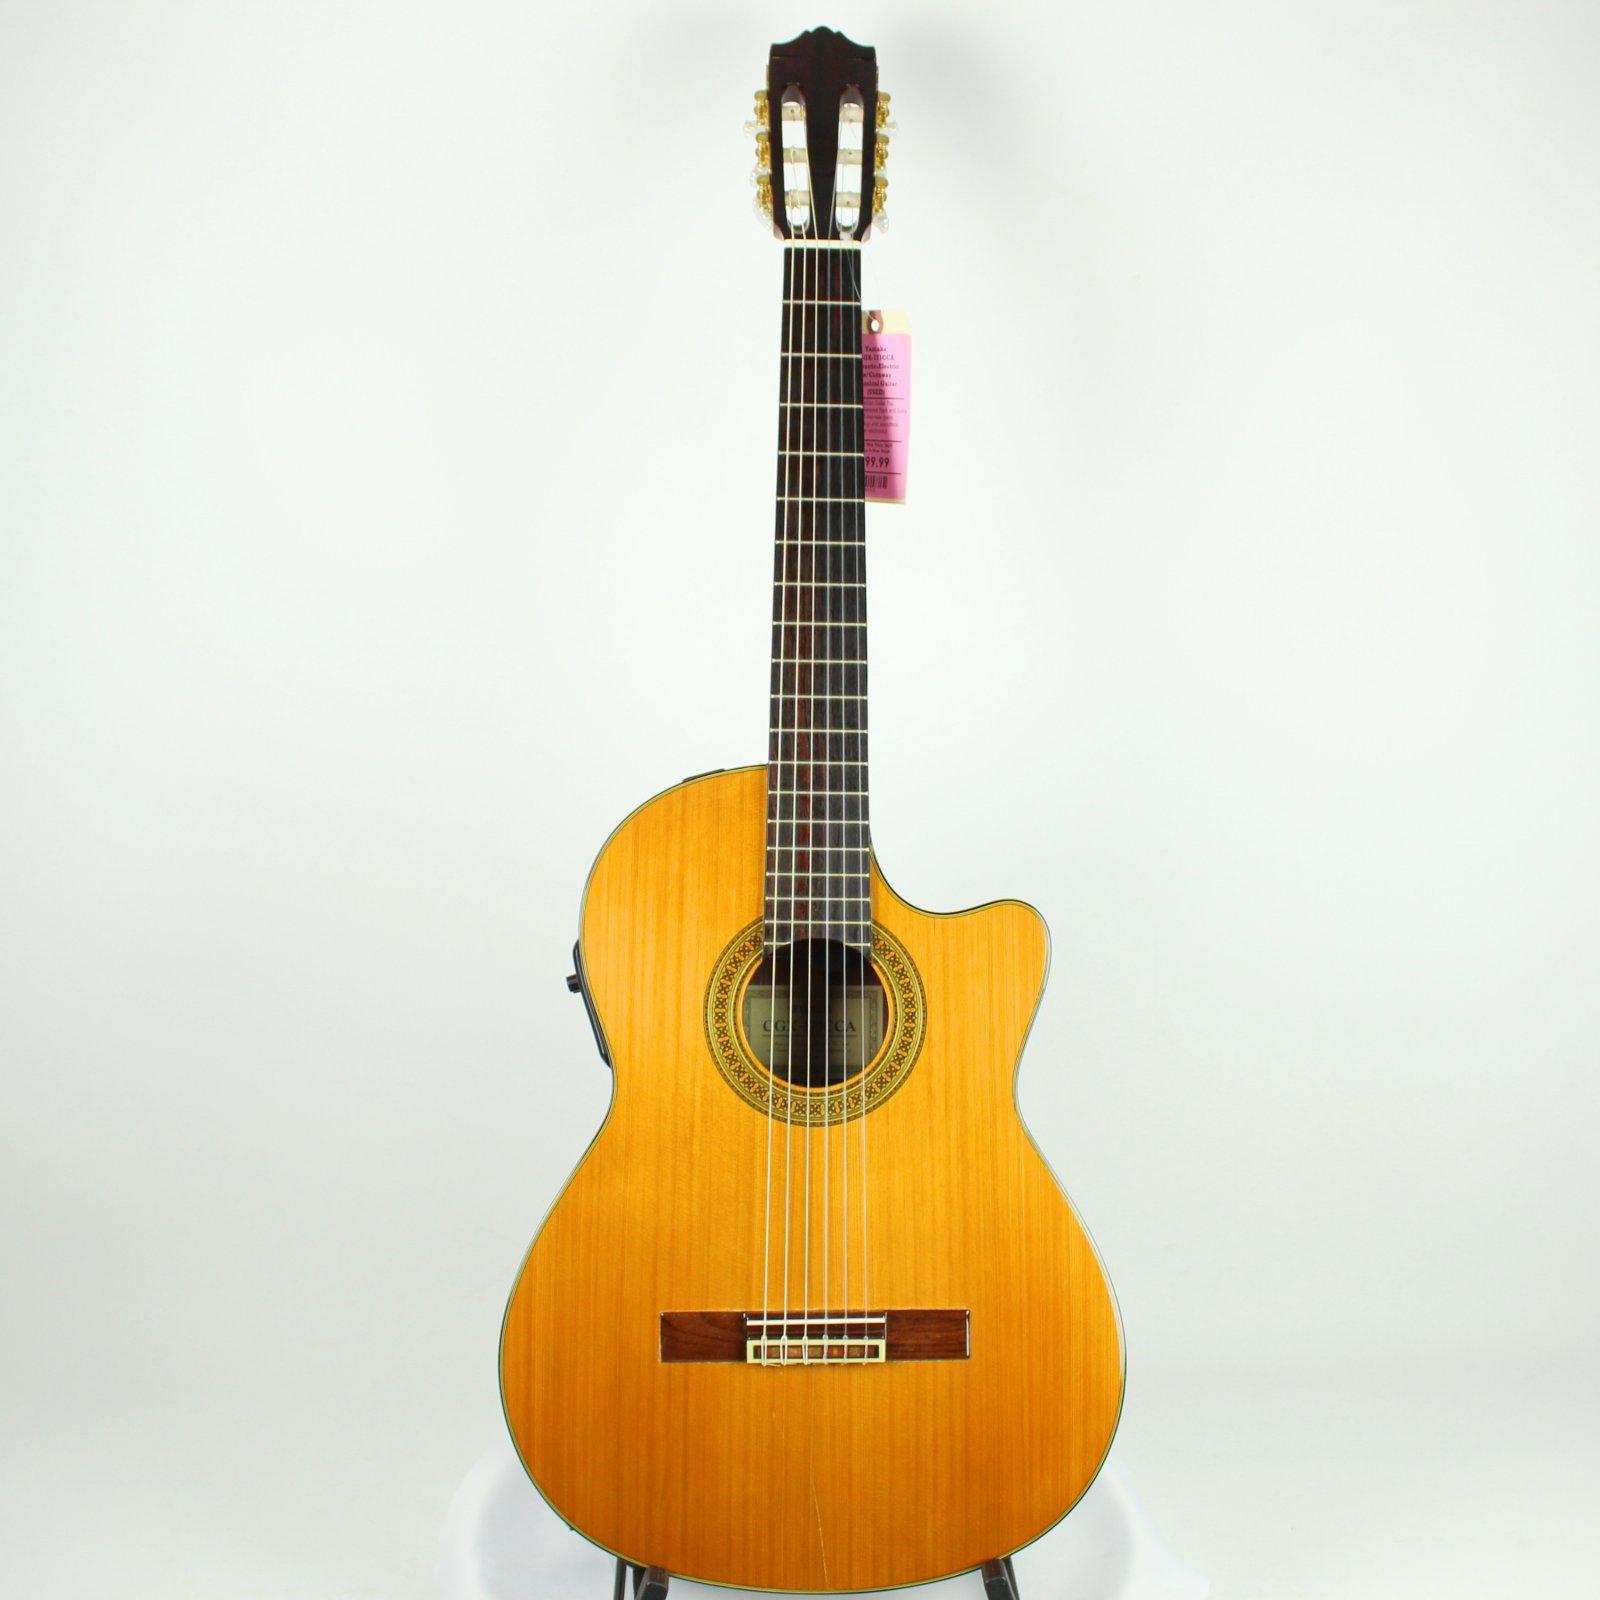 Yamaha CGX-171CCA Acoustic-Electric Cutaway Classical Guitar (USED)